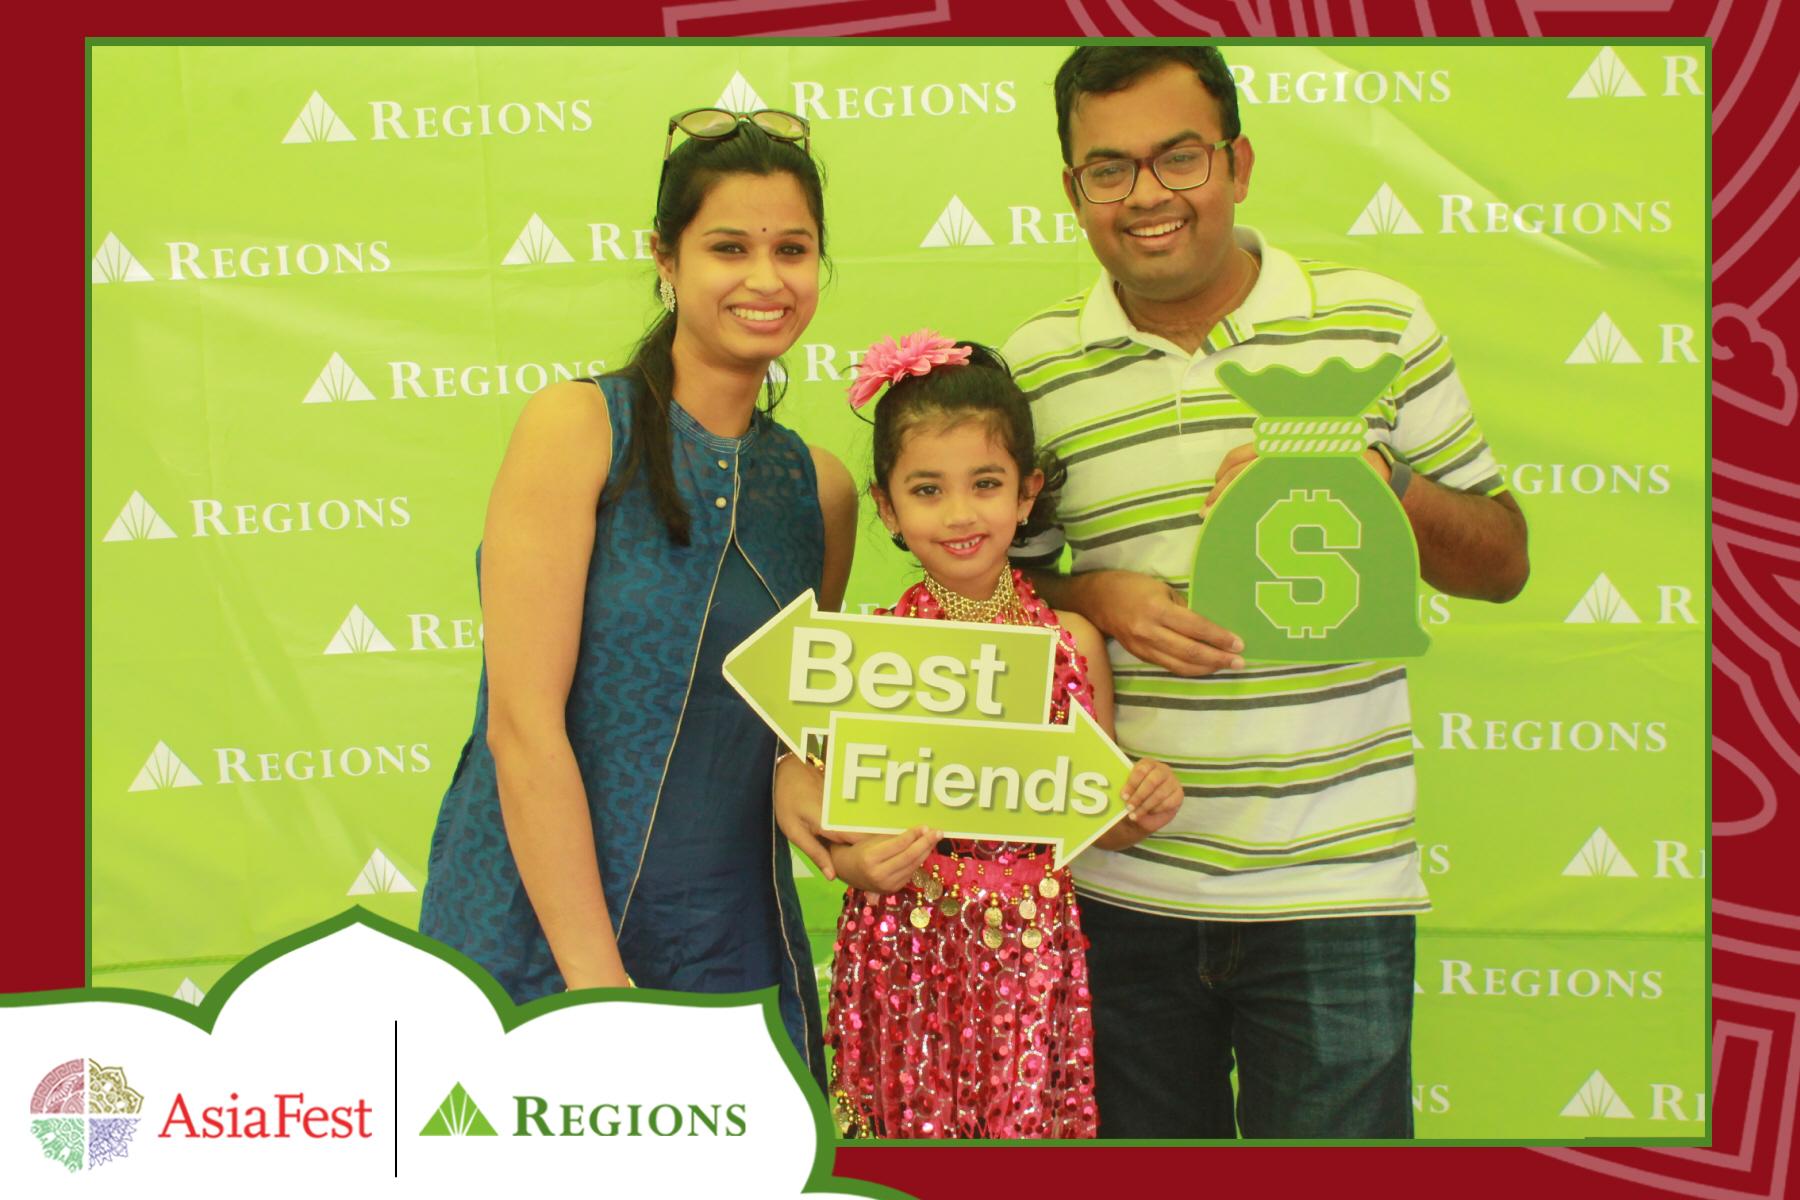 Regions AsiaFest Single